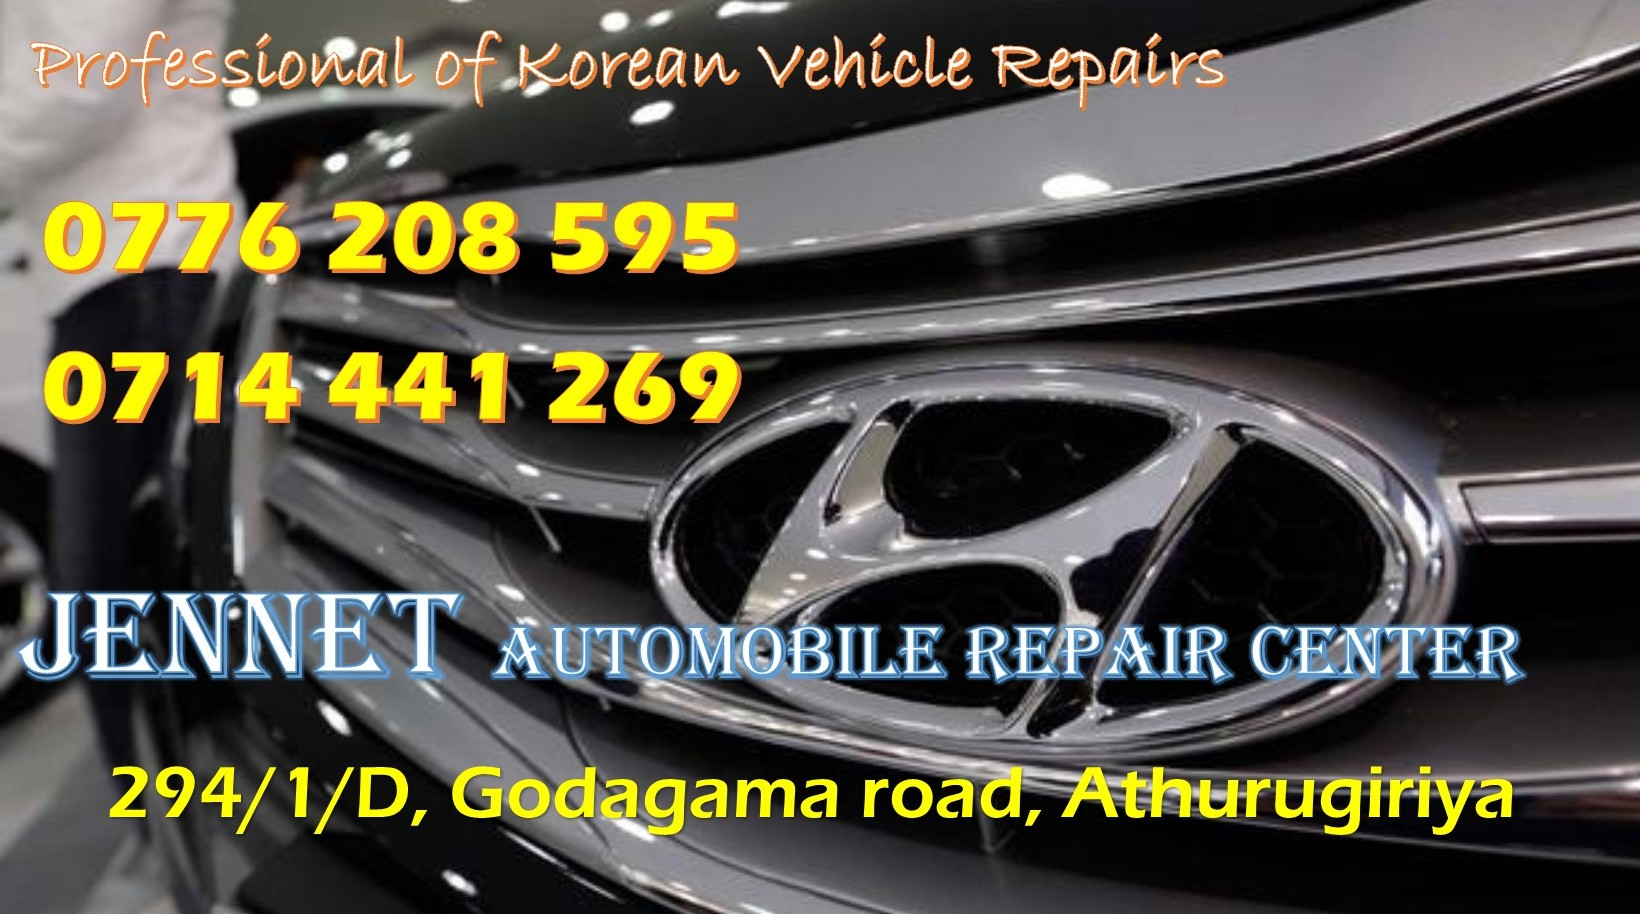 JENNET Automobile Repair Center – Korean vehicle repair, Spare Parts